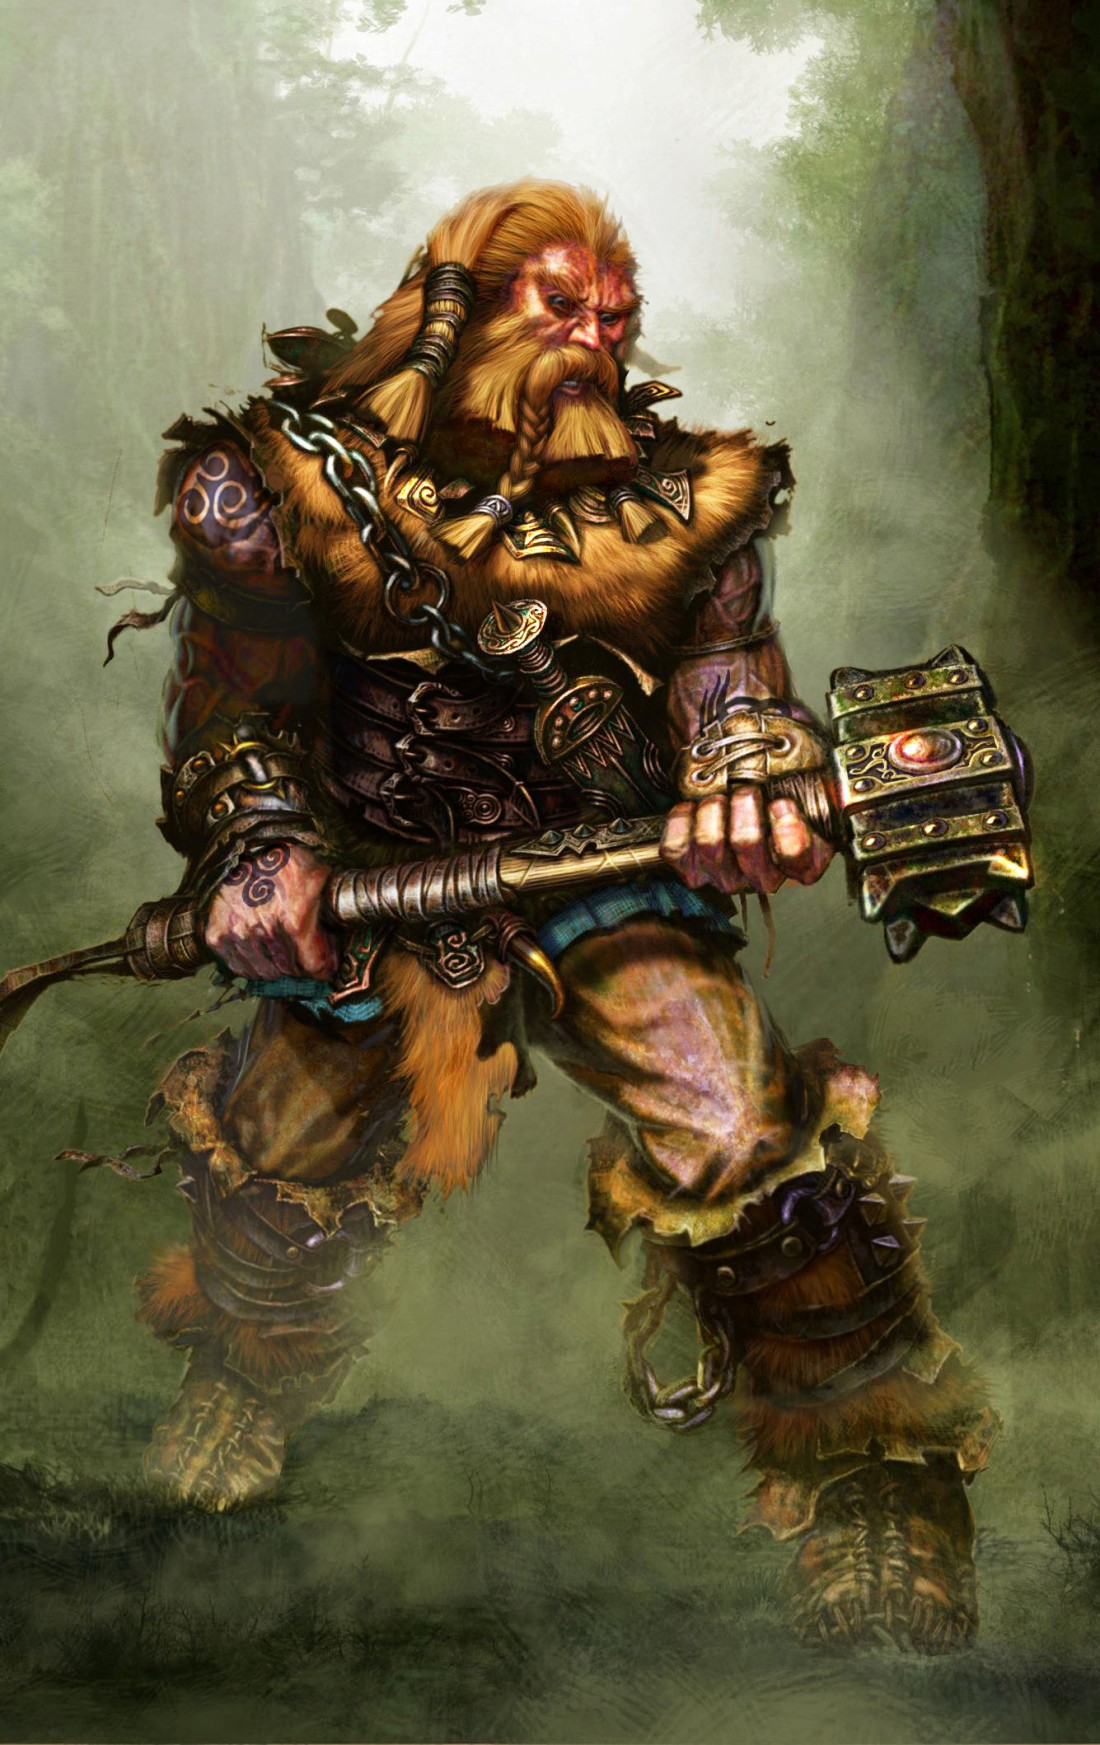 Gary_Freeman_Fantasy_Illustration-Barbarian6